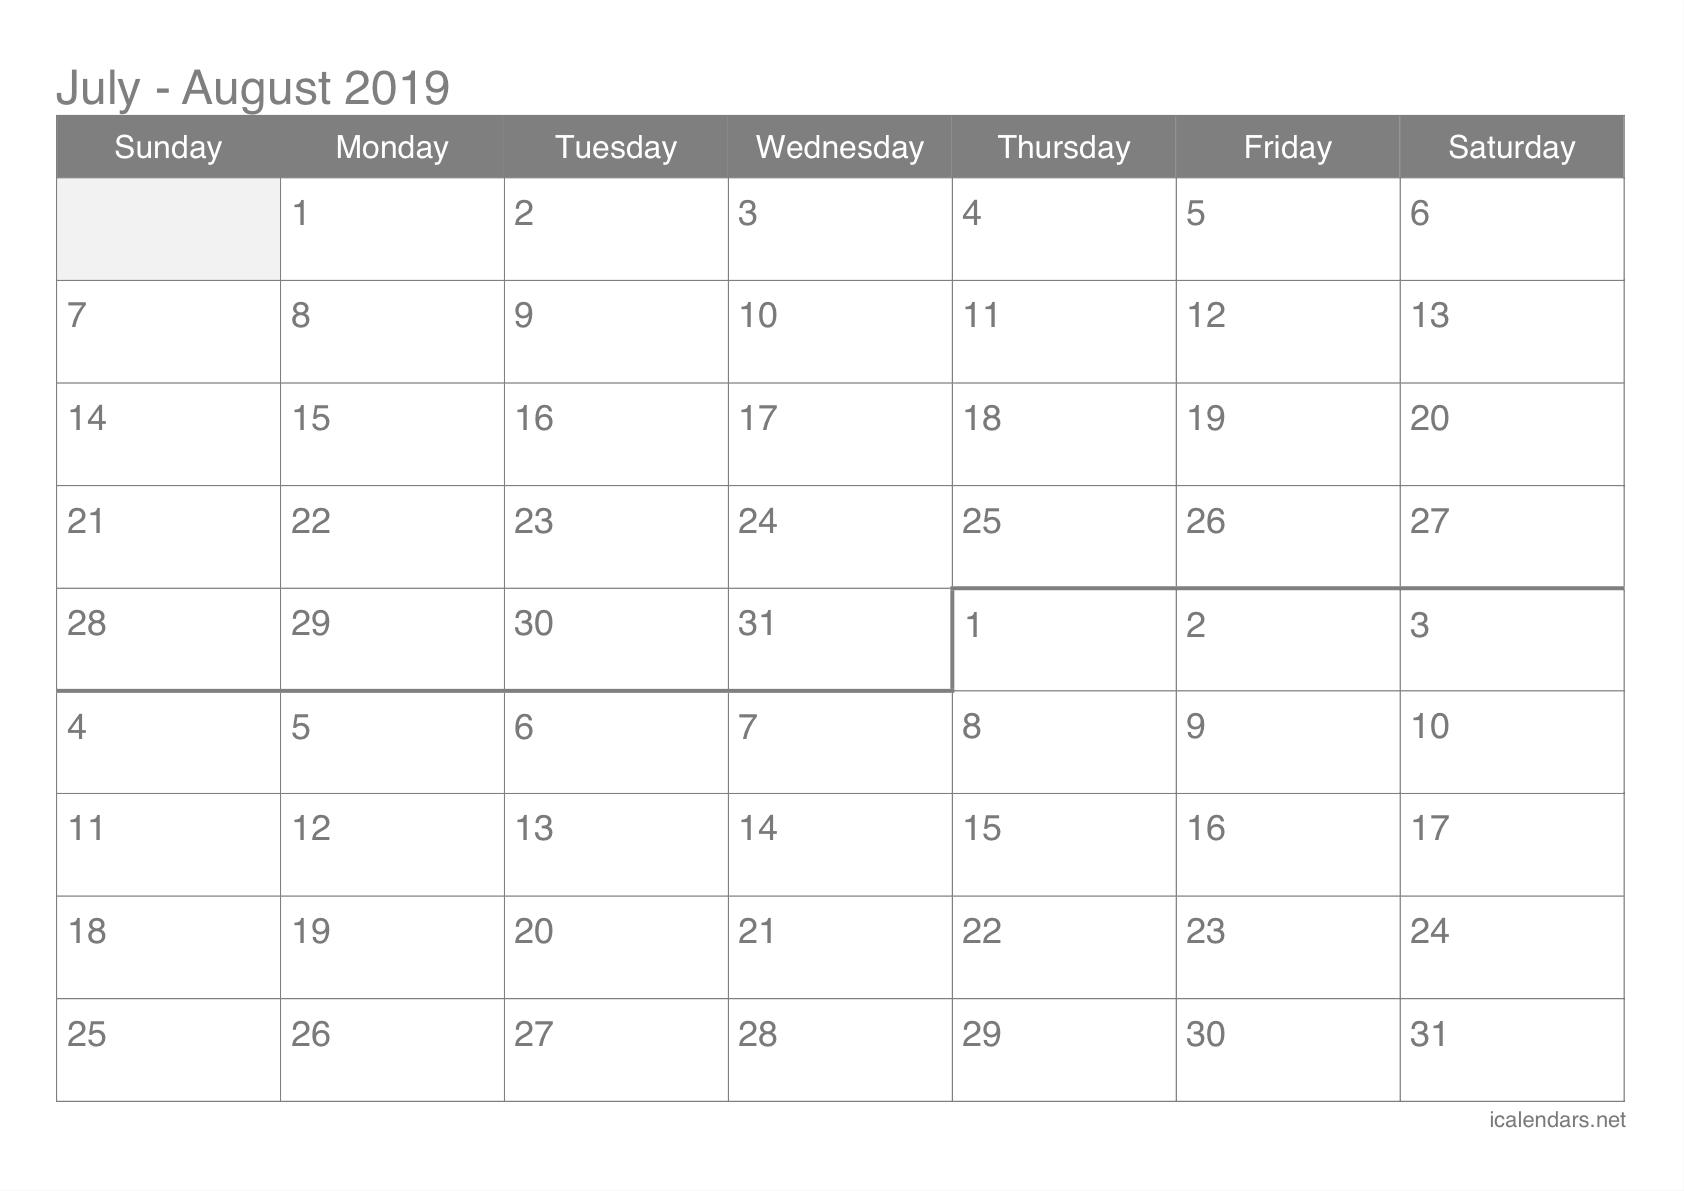 July And August 2019 Printable Calendar – Icalendars July 2 2019 Calendar